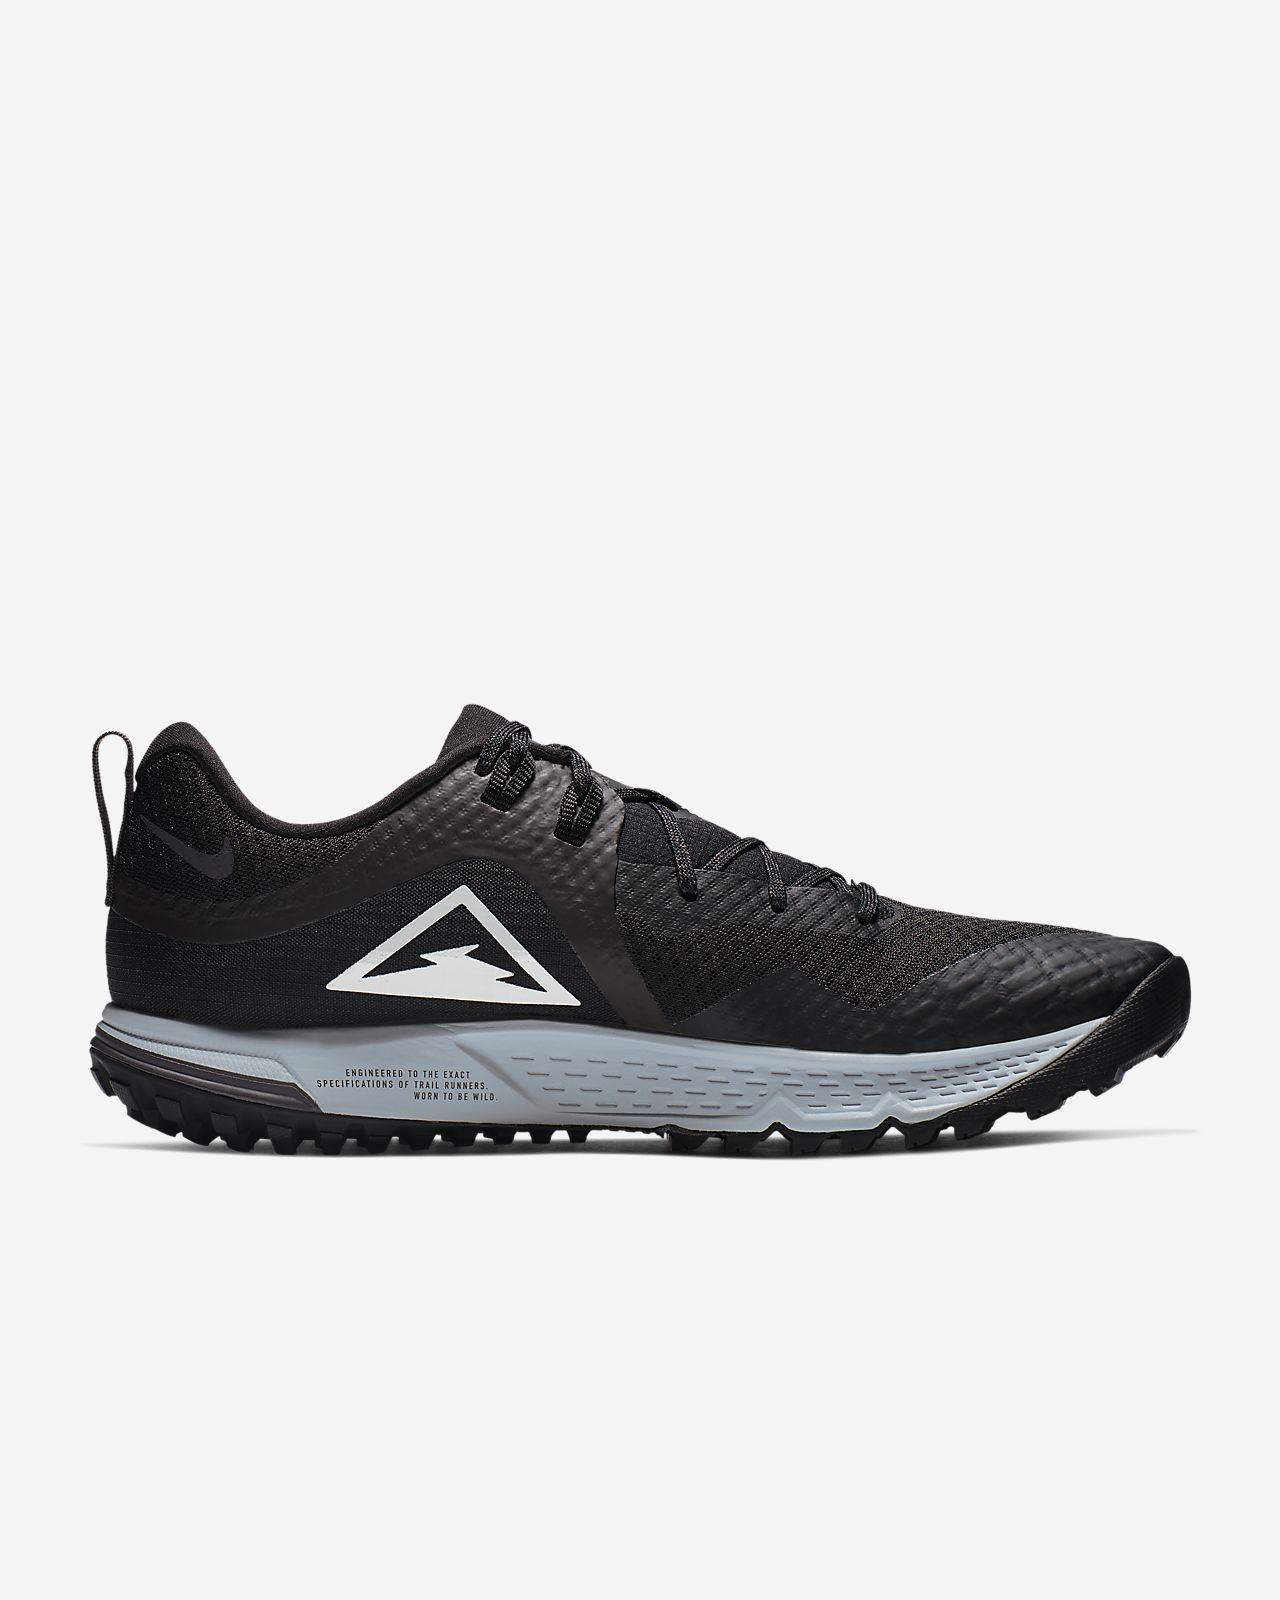 d9672118192 Ανδρικό παπούτσι για τρέξιμο Nike Air Zoom Wildhorse 5. Nike.com GR